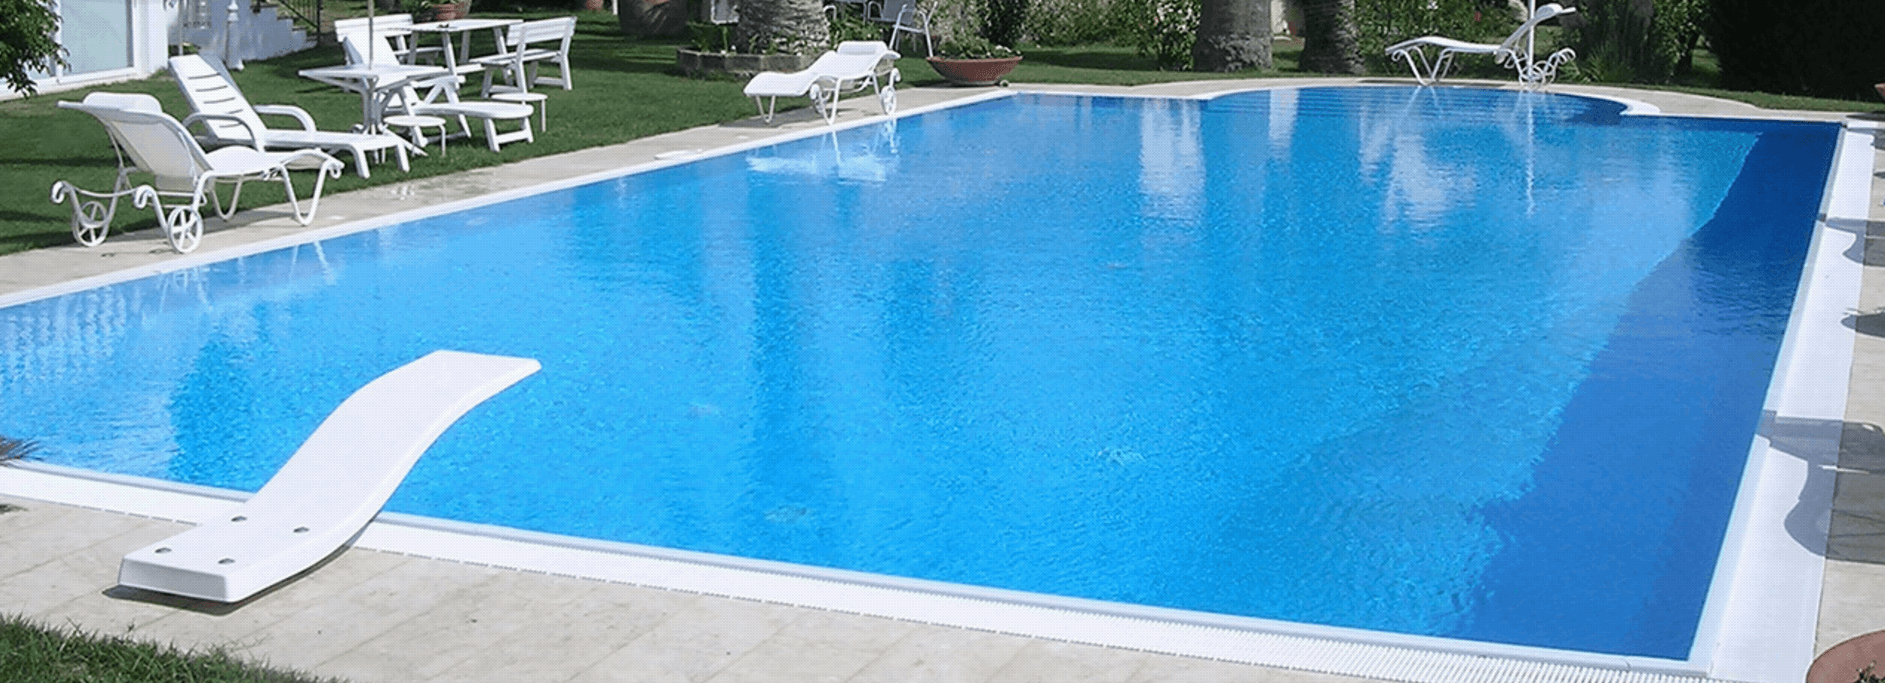 piscina rettangolare